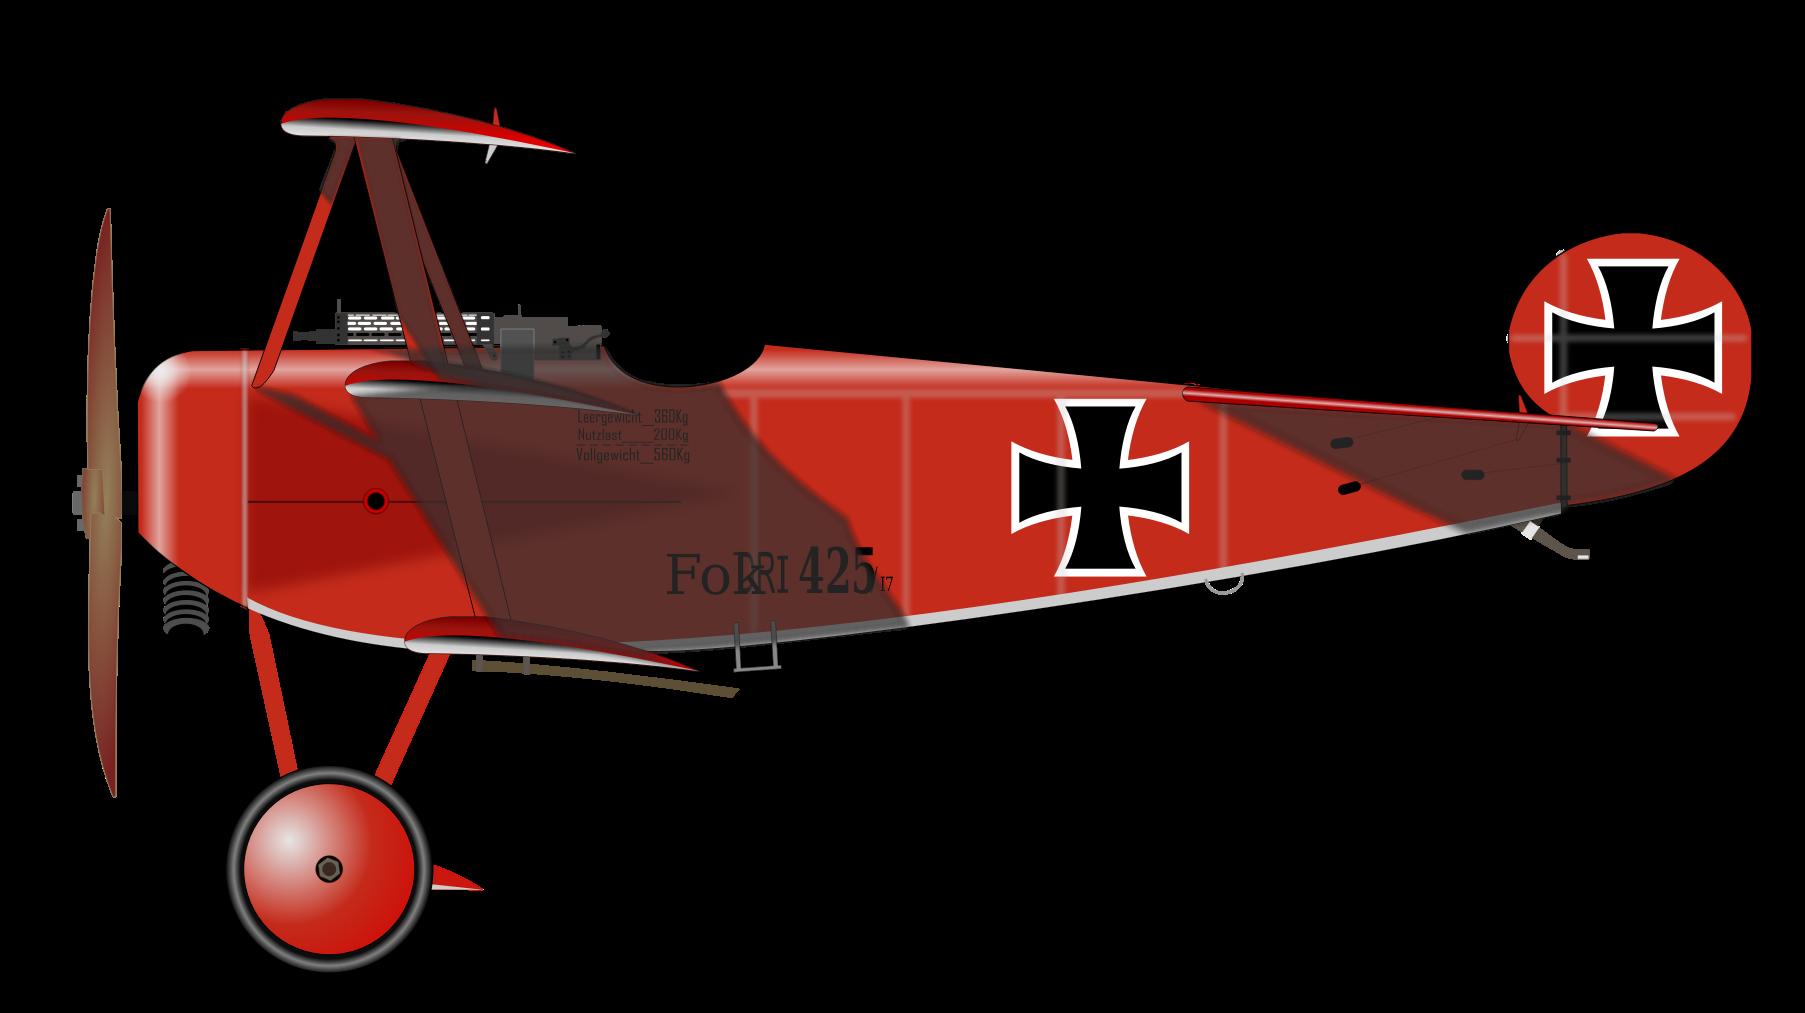 1805x1013 Clipart Plane